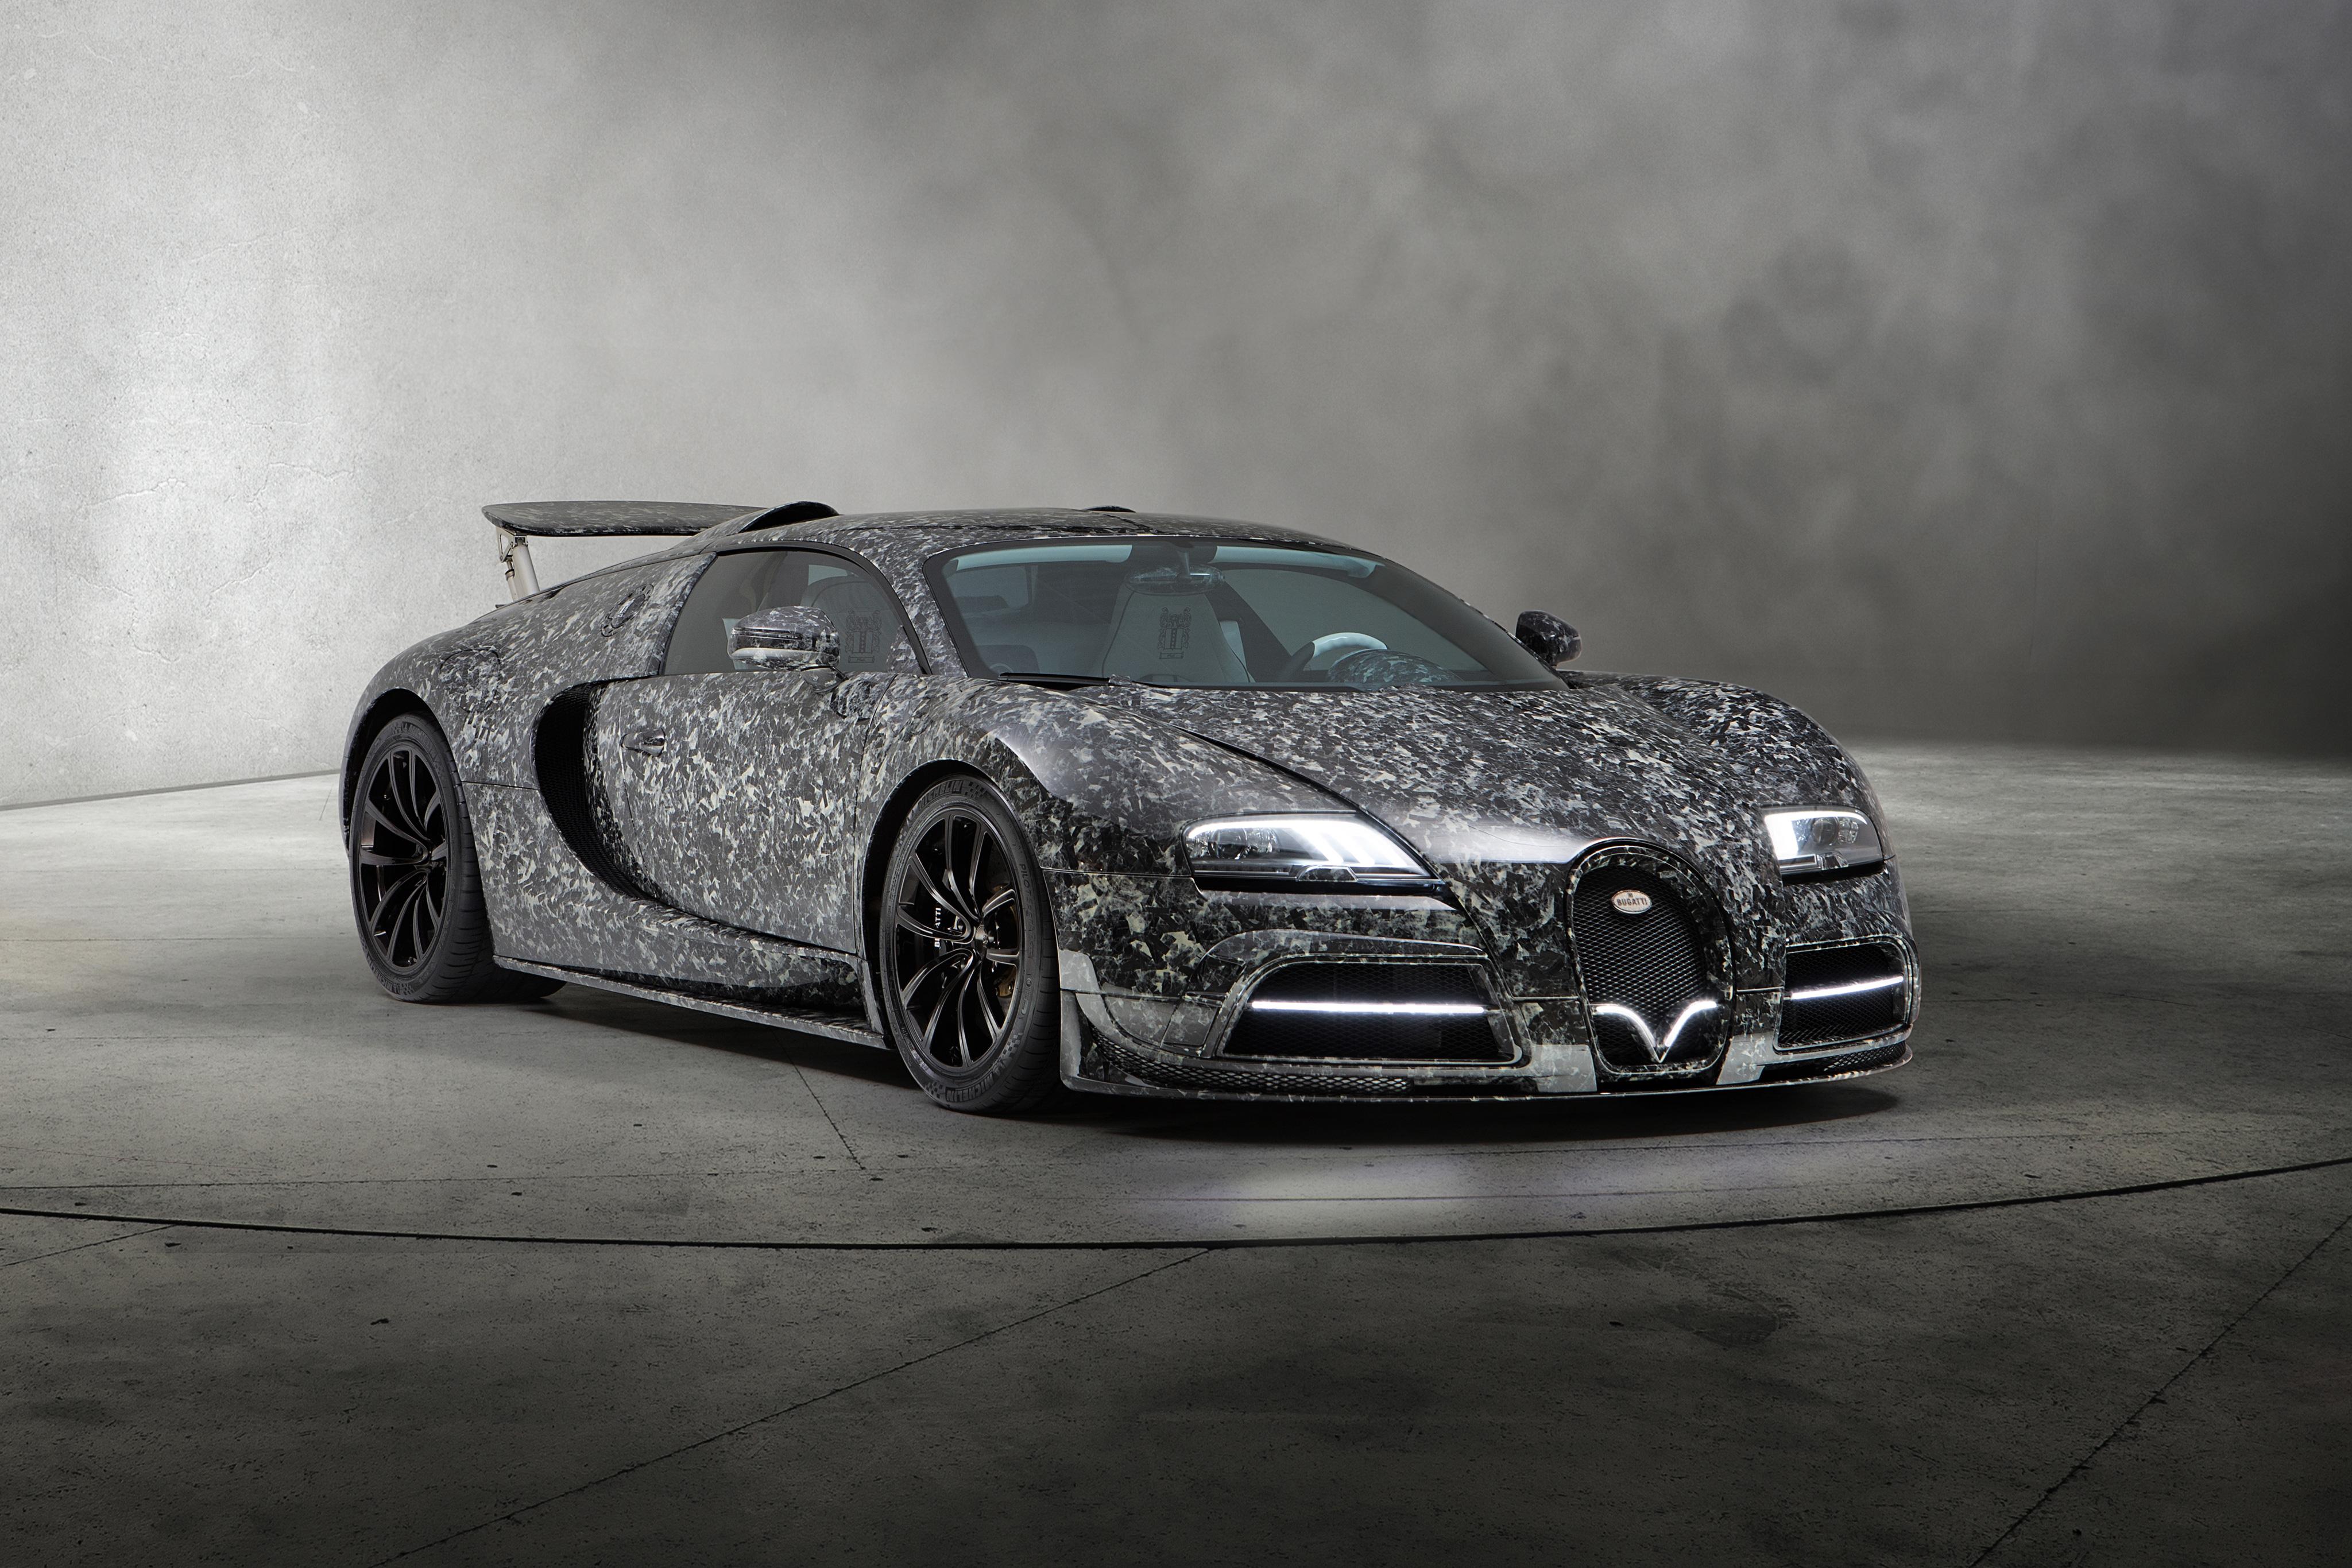 Mansory Bugatti Veyron Vivere Diamond Edition 2018 Hd Cars 4k